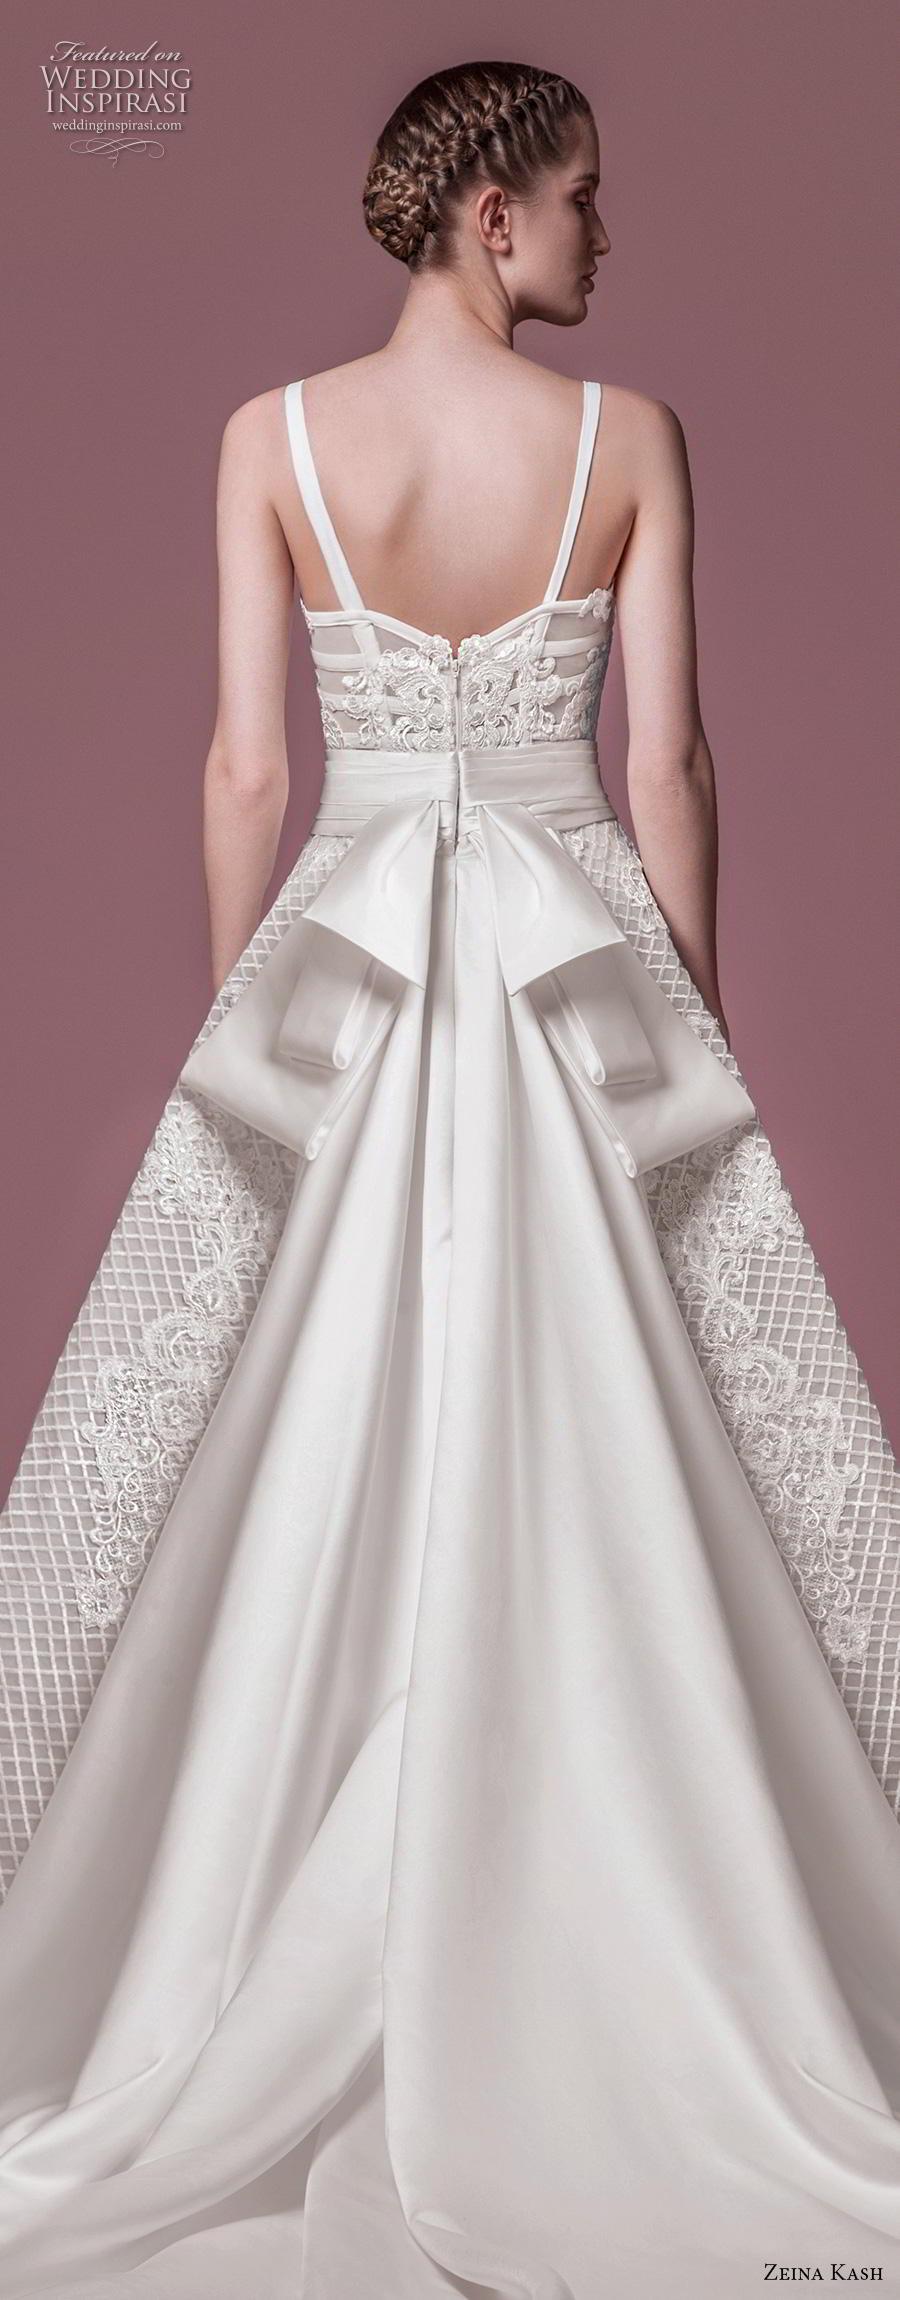 zeina kash 2018 bridal thin strap sweetheart neckline sweetheart neckline full embellishment bustier romantic a  line wedding dress chapel train (1) zbv